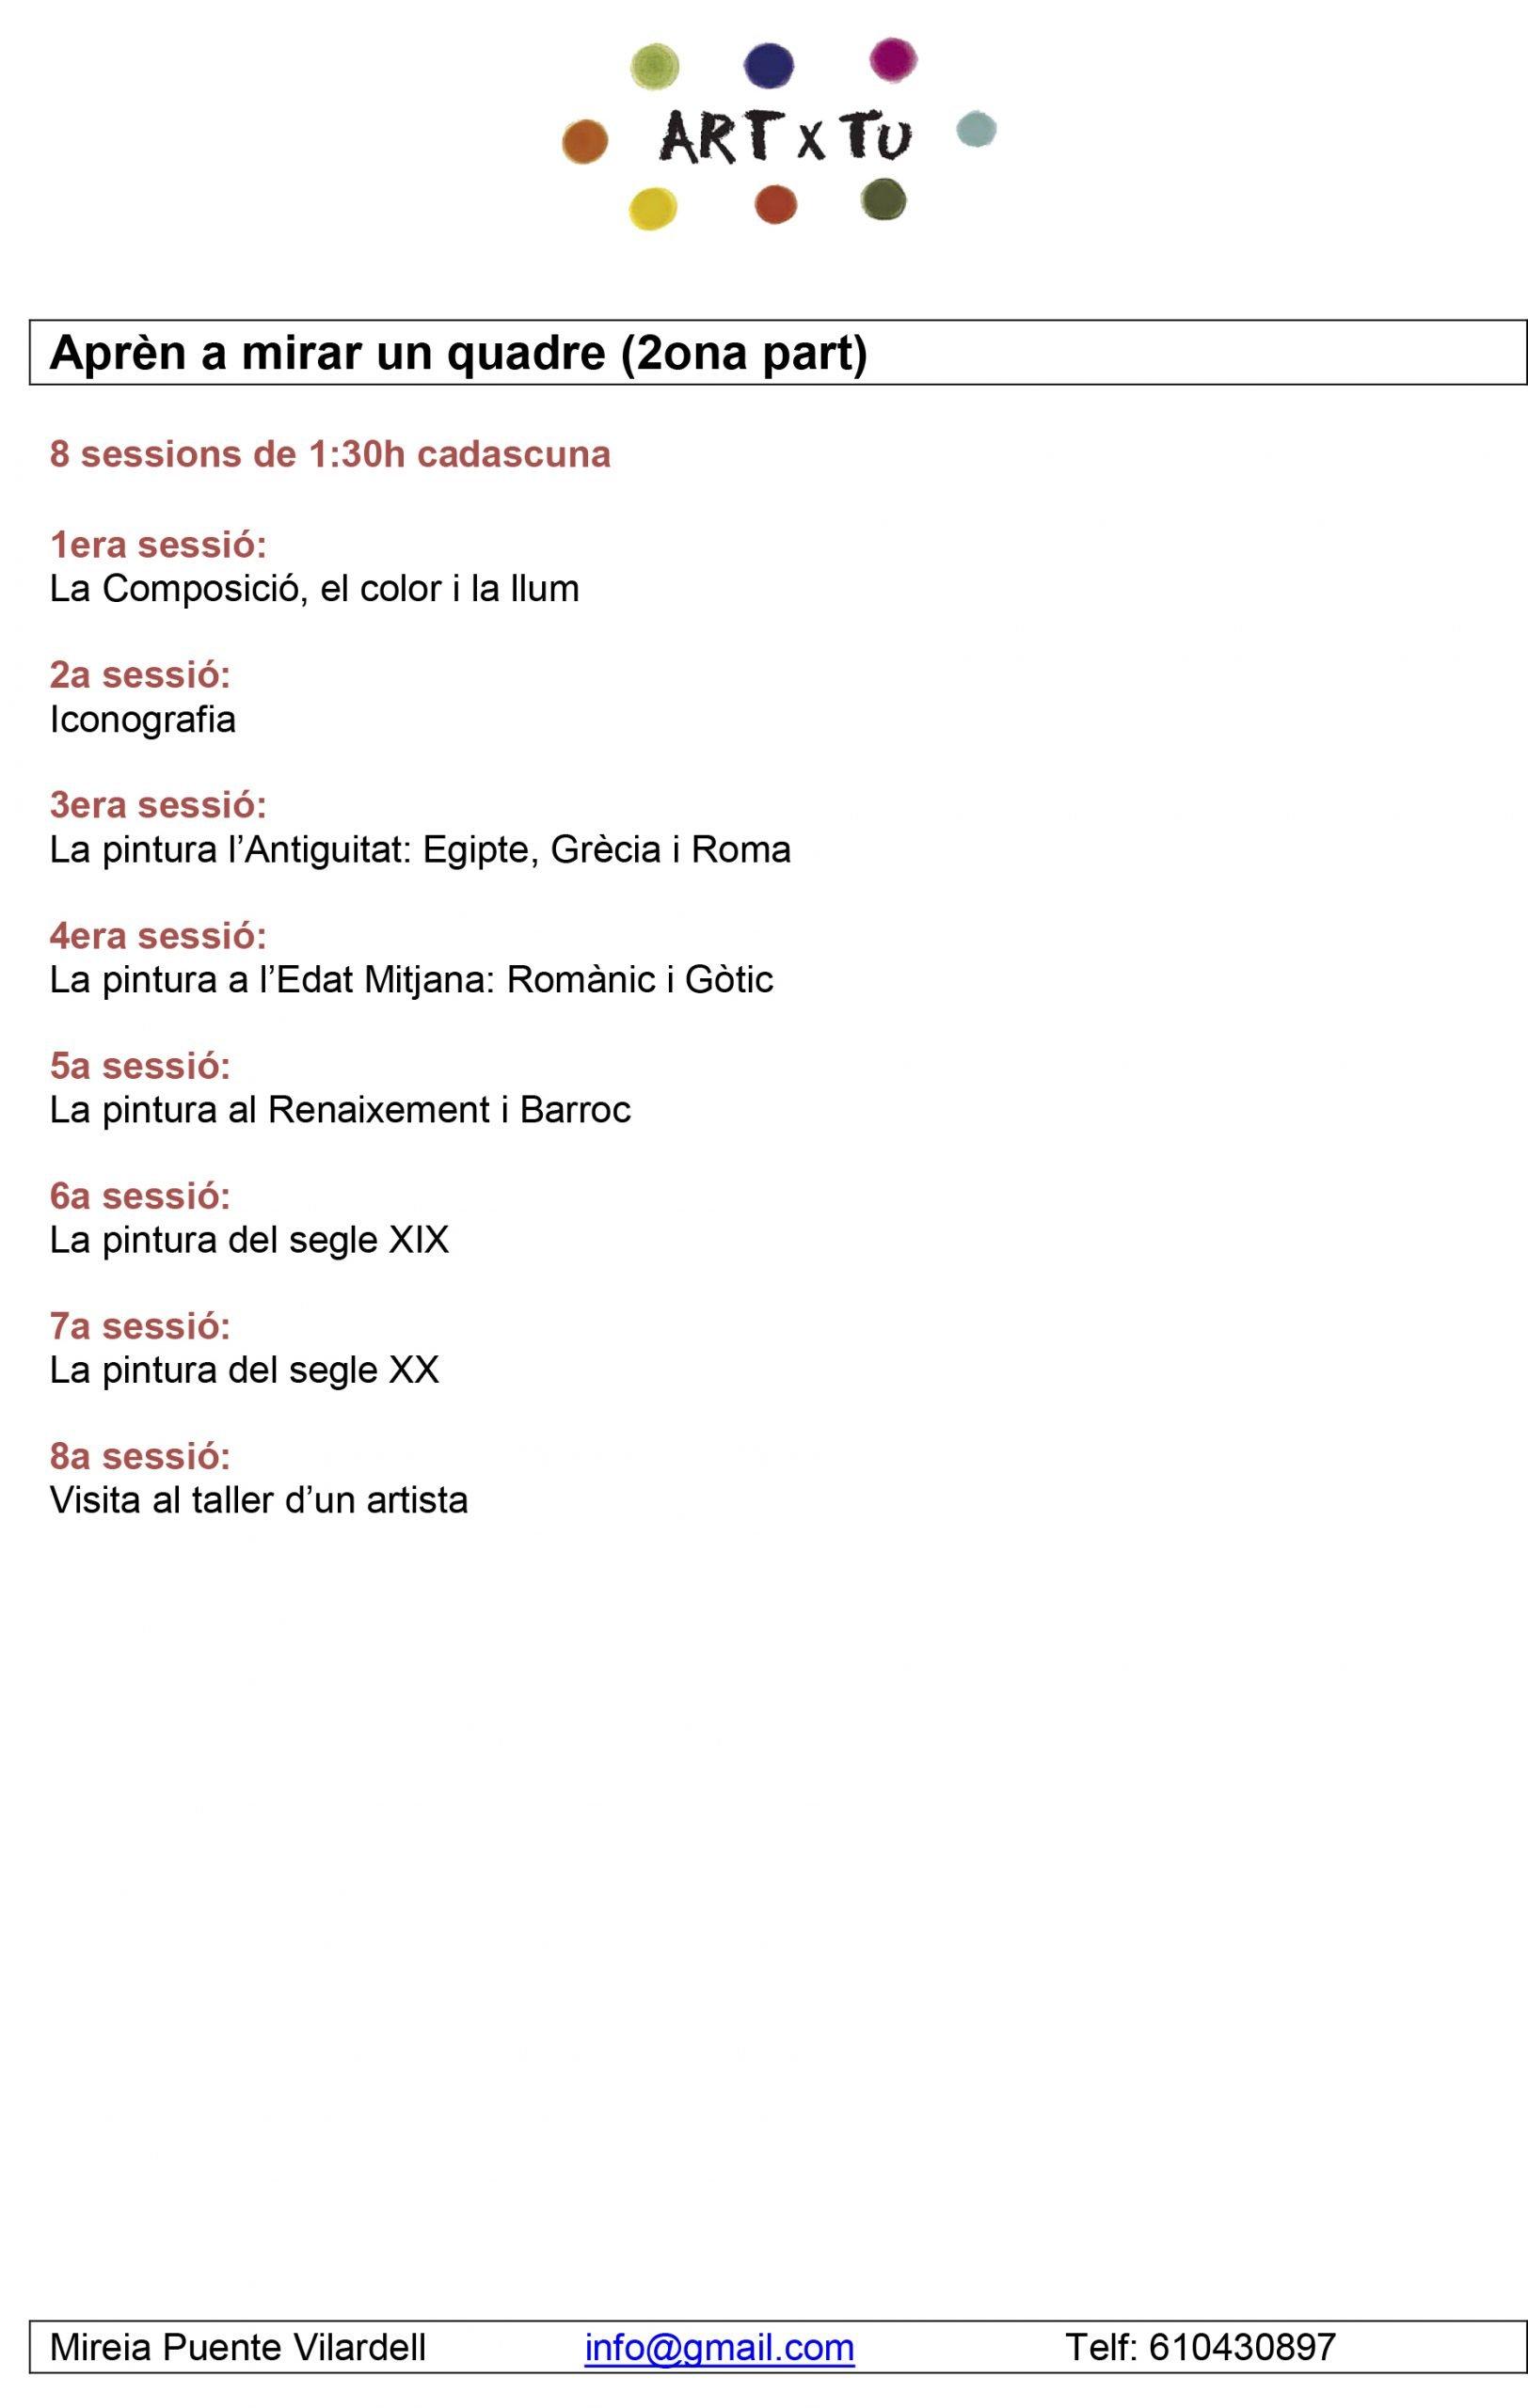 Apren-a-mirar-un-quadre-programa-2a-part-scaled Prueba calendario